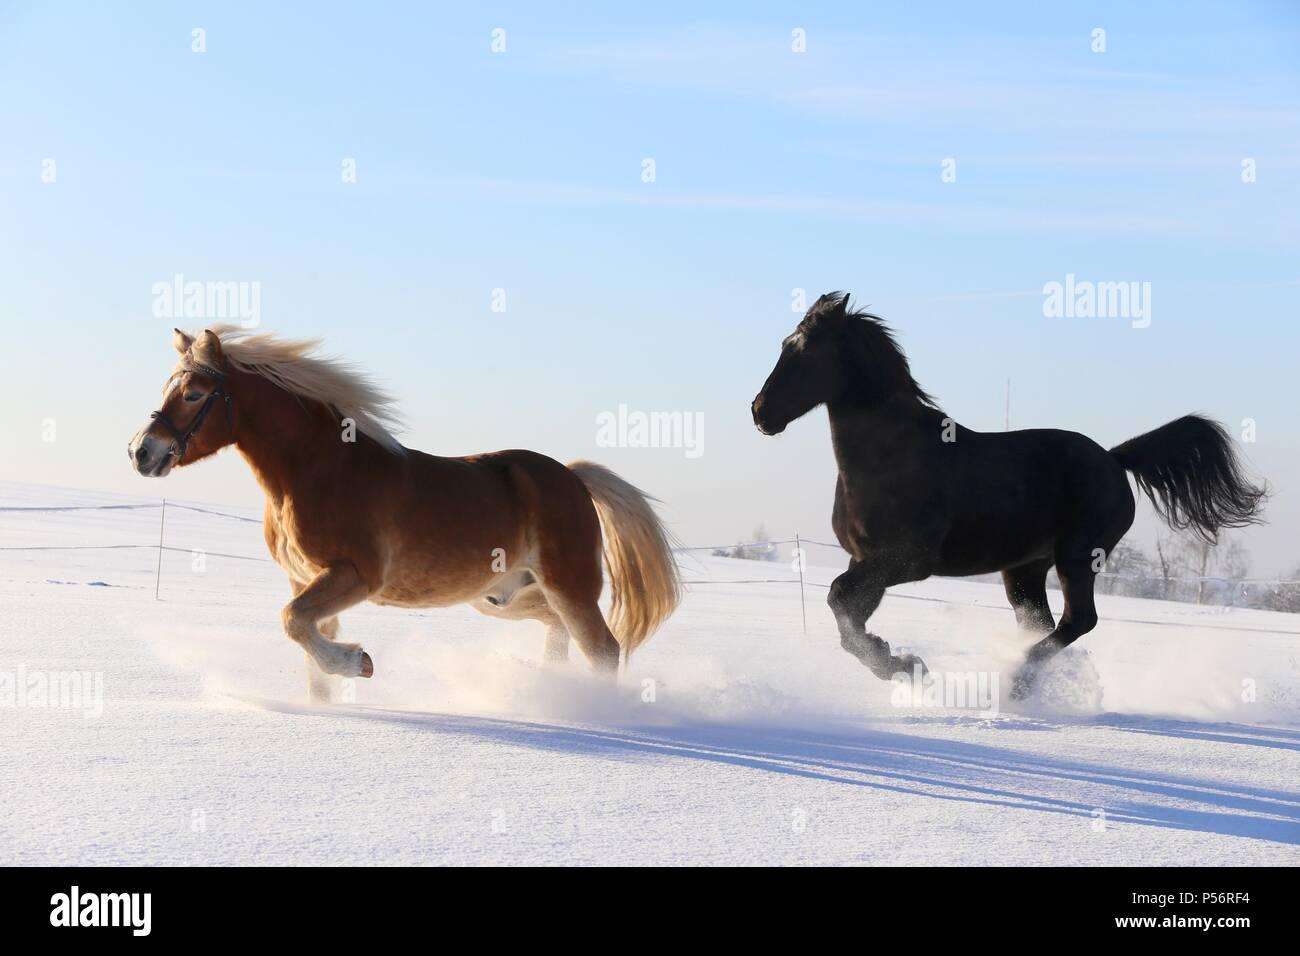 2 horses - Stock Image